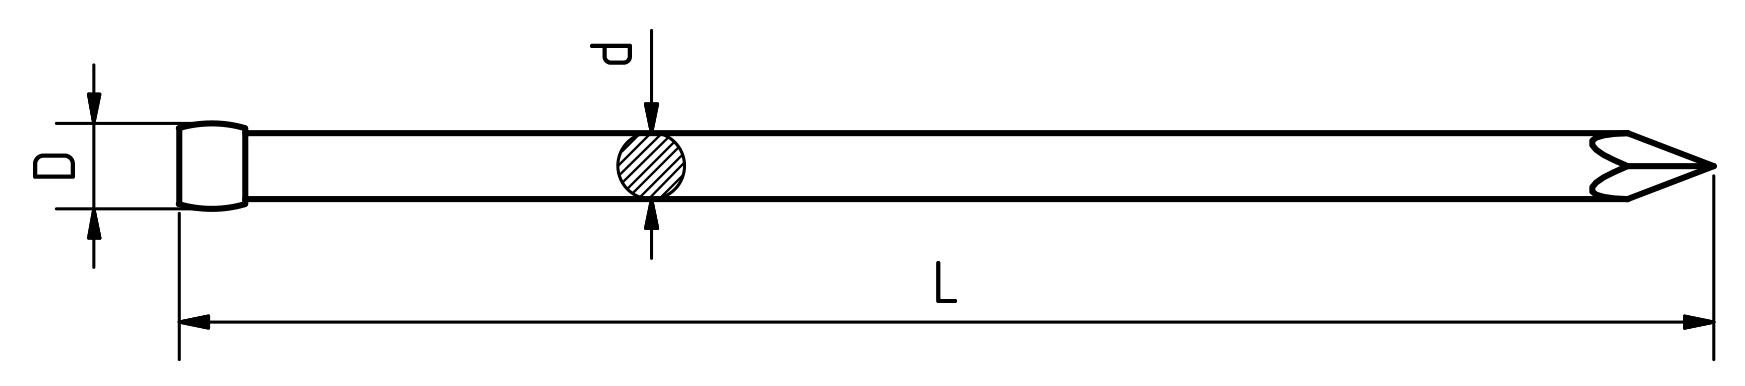 1.3_Stauchkopfnagel-28x65